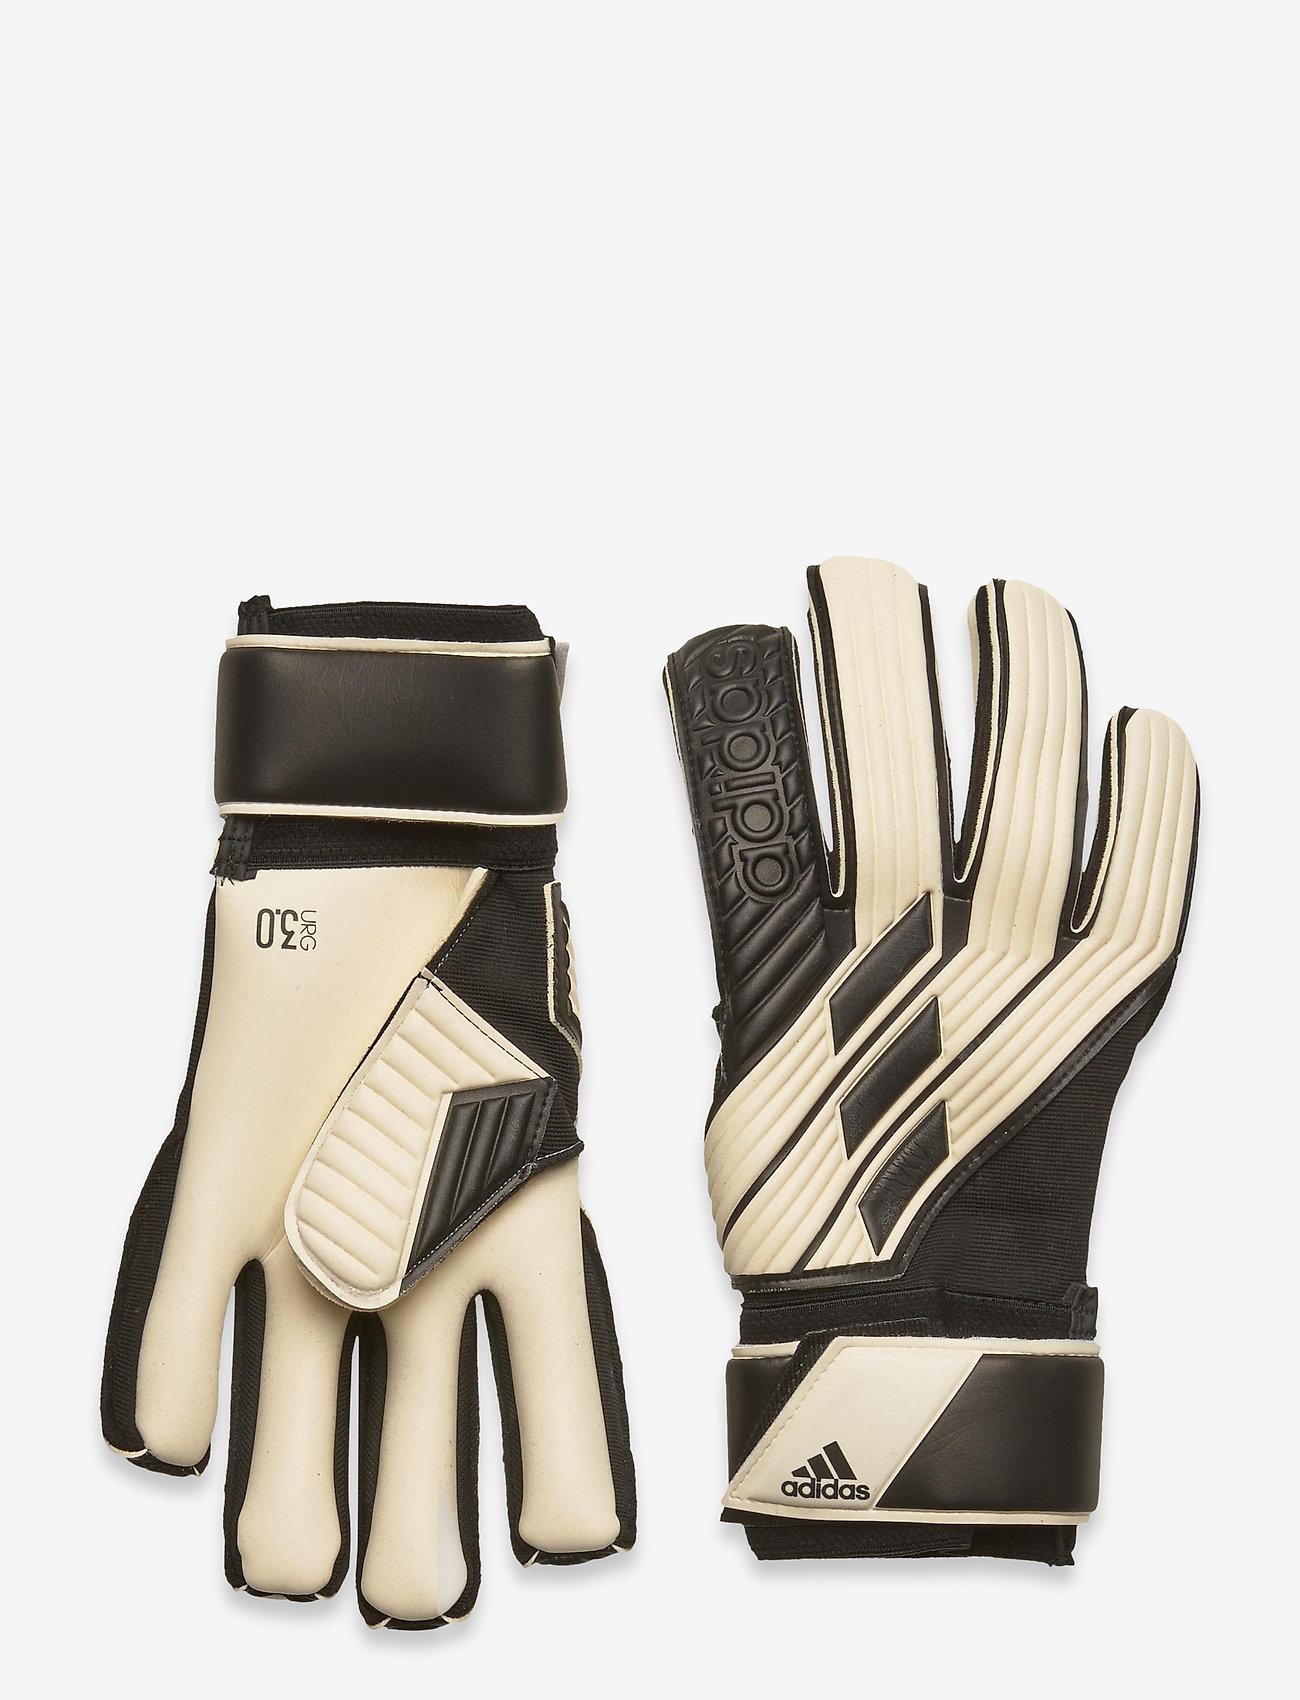 adidas Performance - Tiro League Goalkeeper Gloves - sprzęt piłkarski - white/black - 0